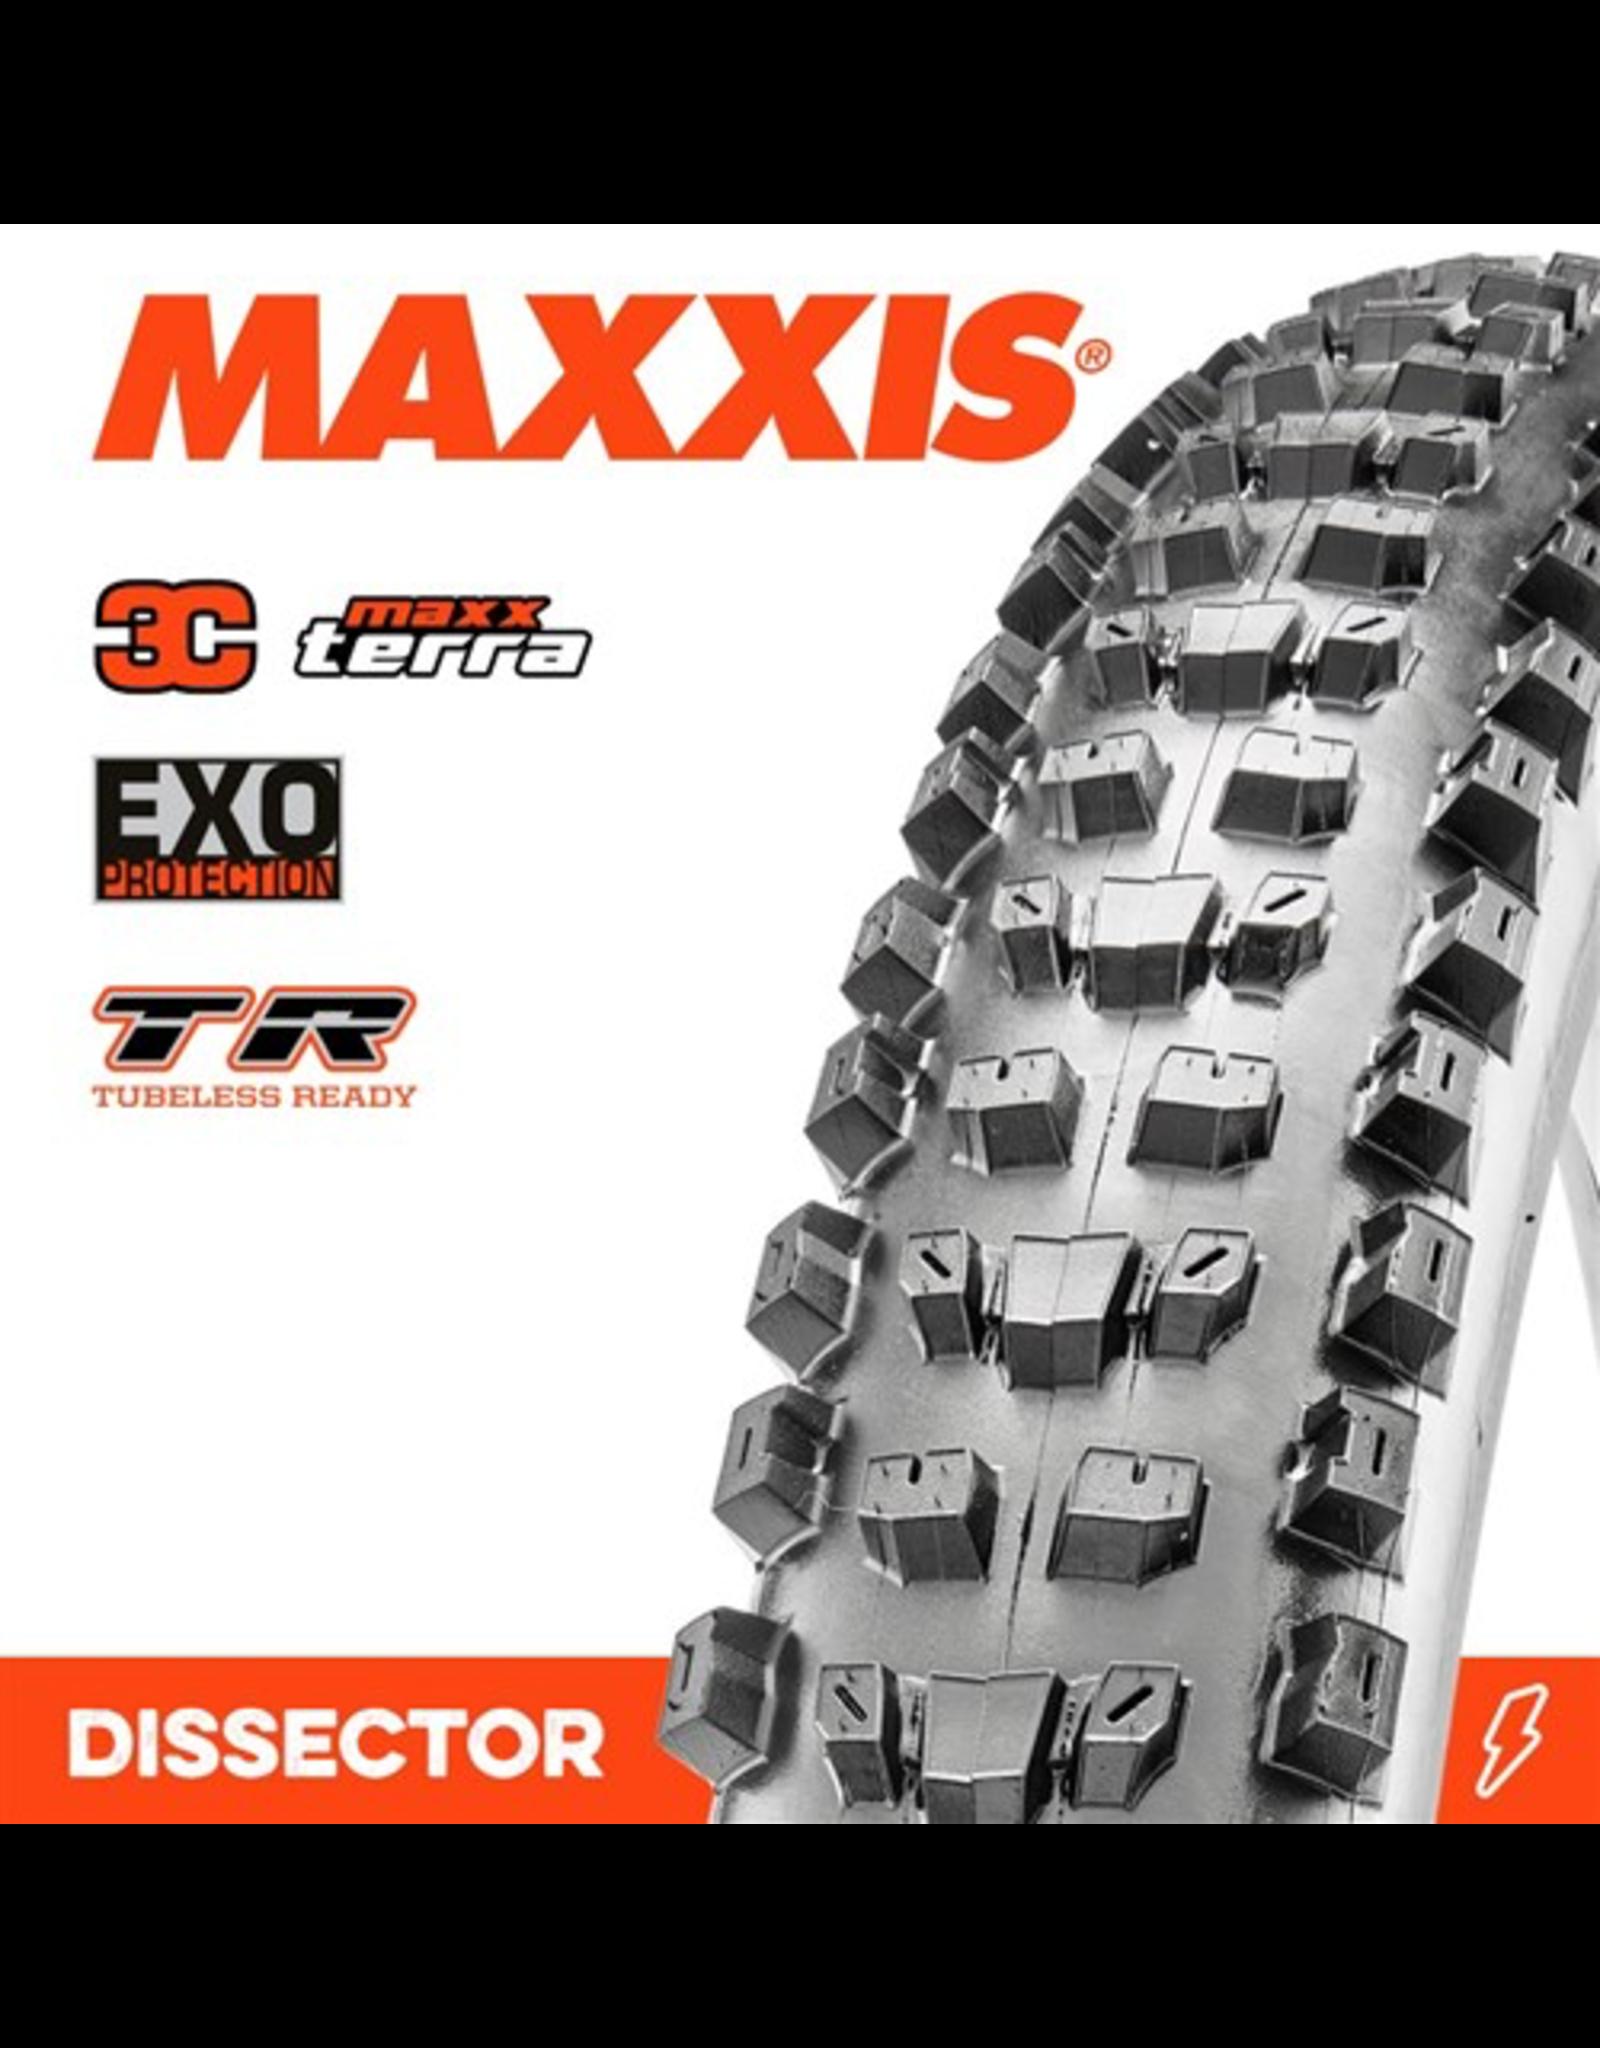 "MAXXIS TYRE MAXXIS DISSECTOR 29 X 2.40"" WT 3C MAXX TERRA EXO TR FOLD 60TPI"